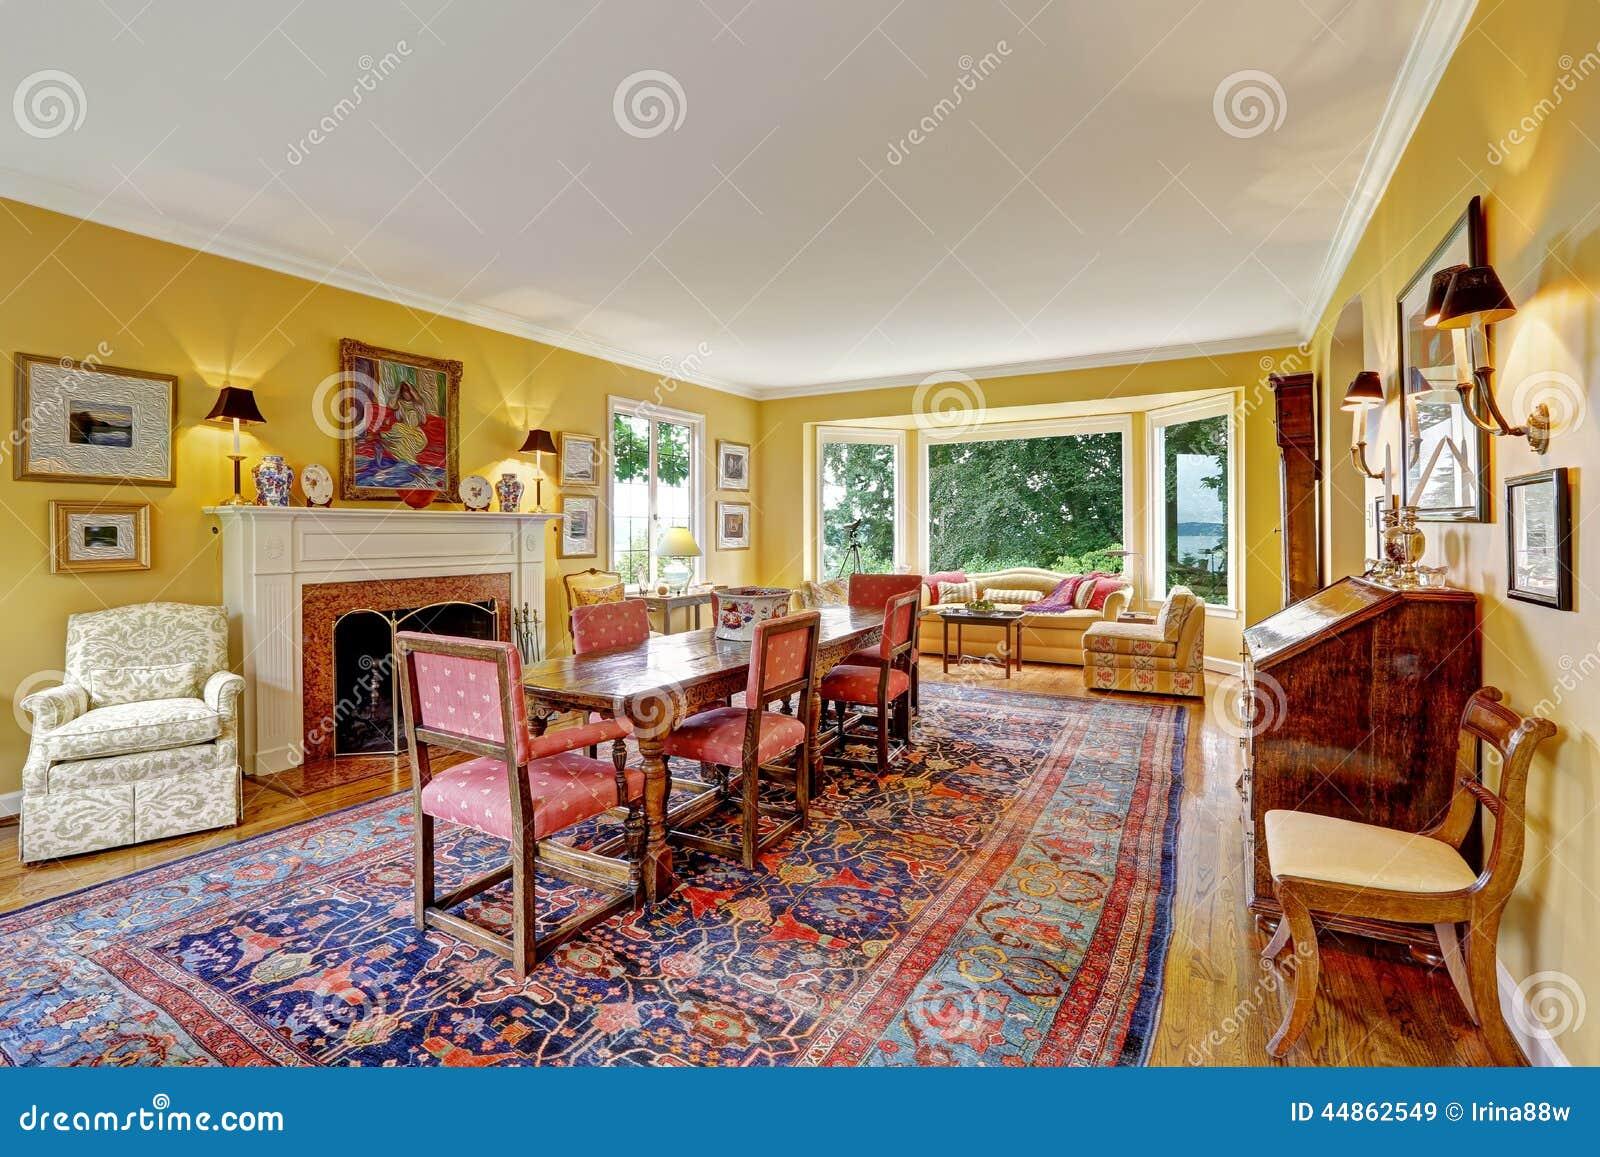 Woonkamer met antieke meubilair en eettafel stock - Decoracion con muebles antiguos ...